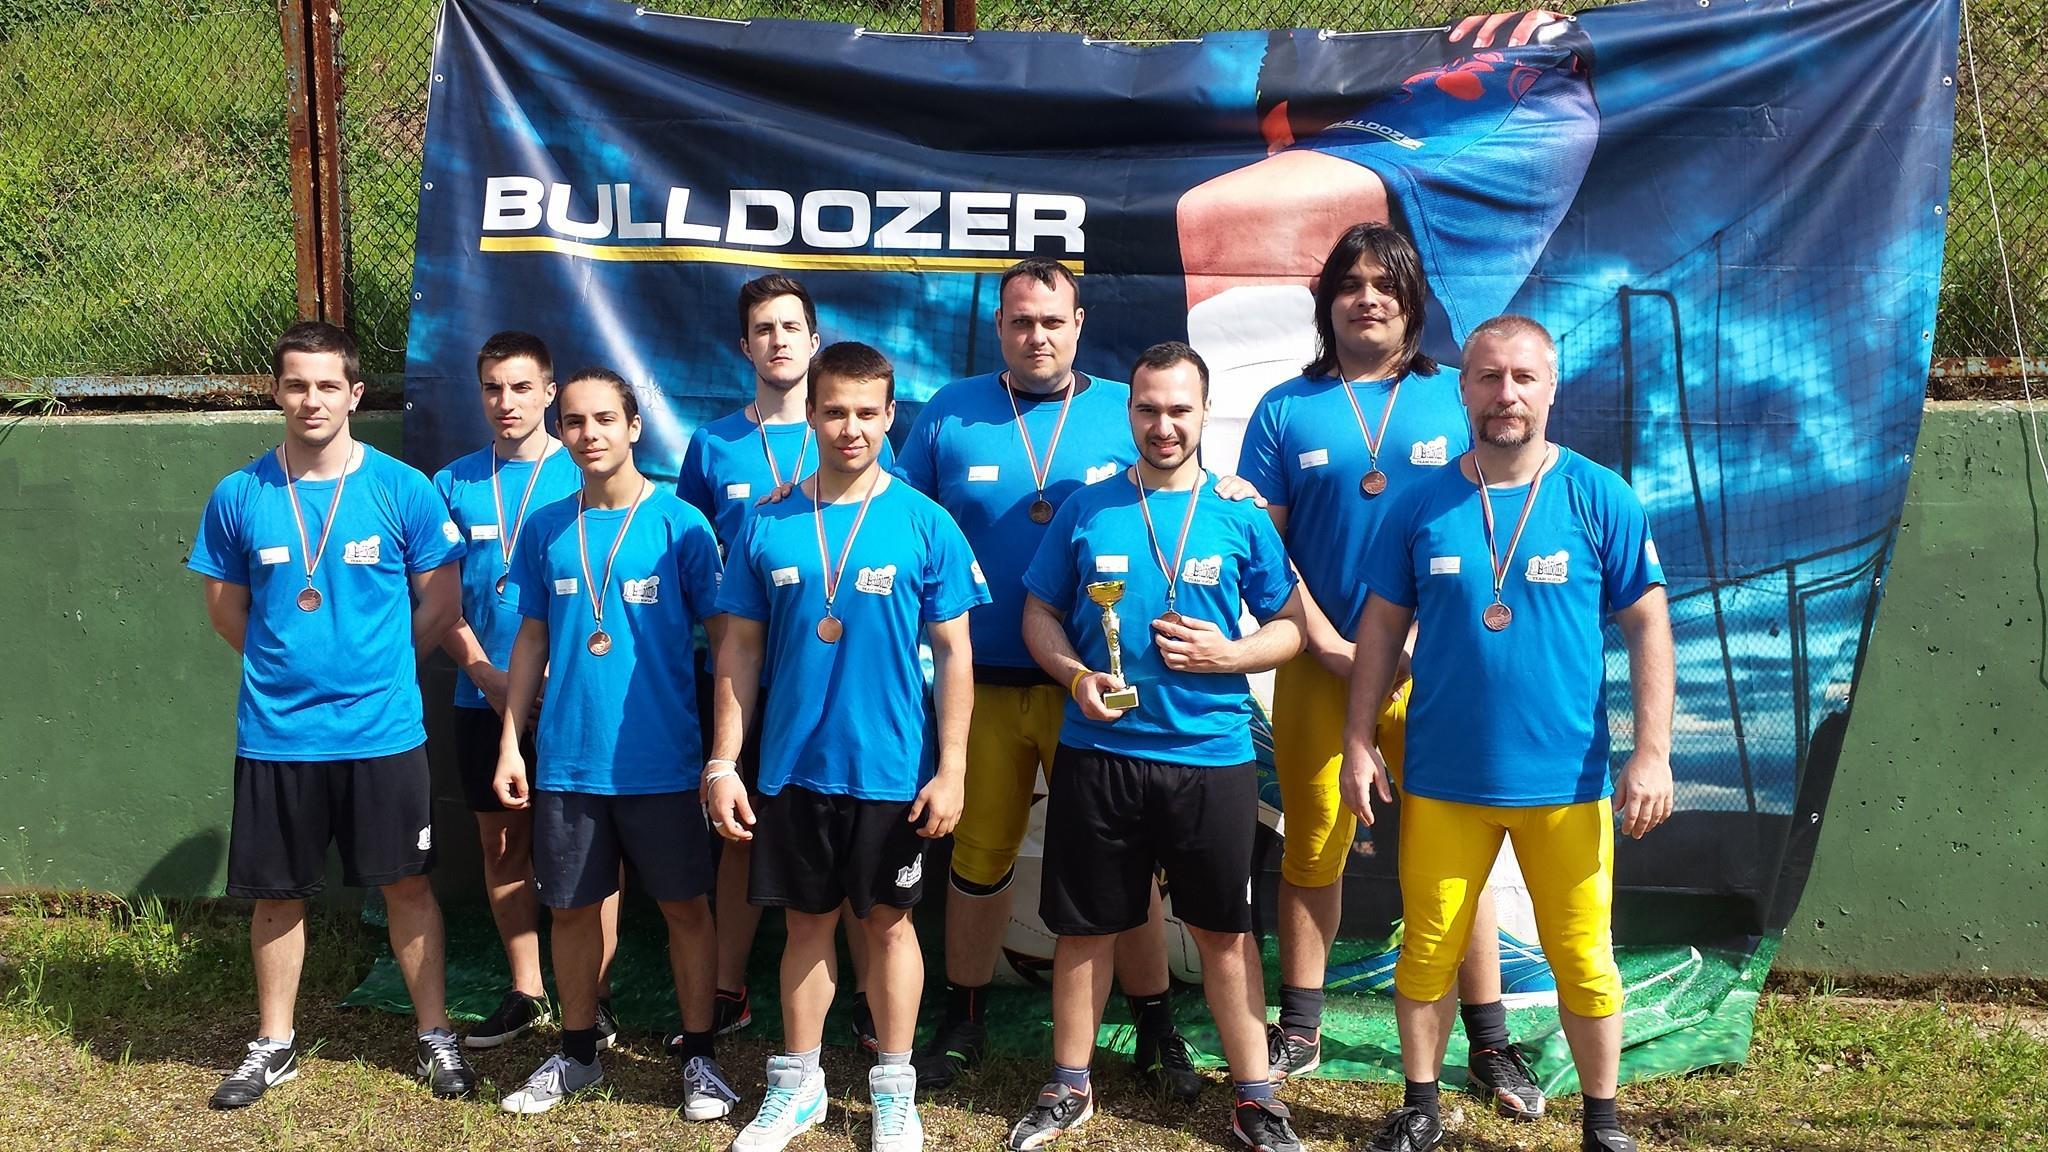 Sofia Bulldozers флаг футбол